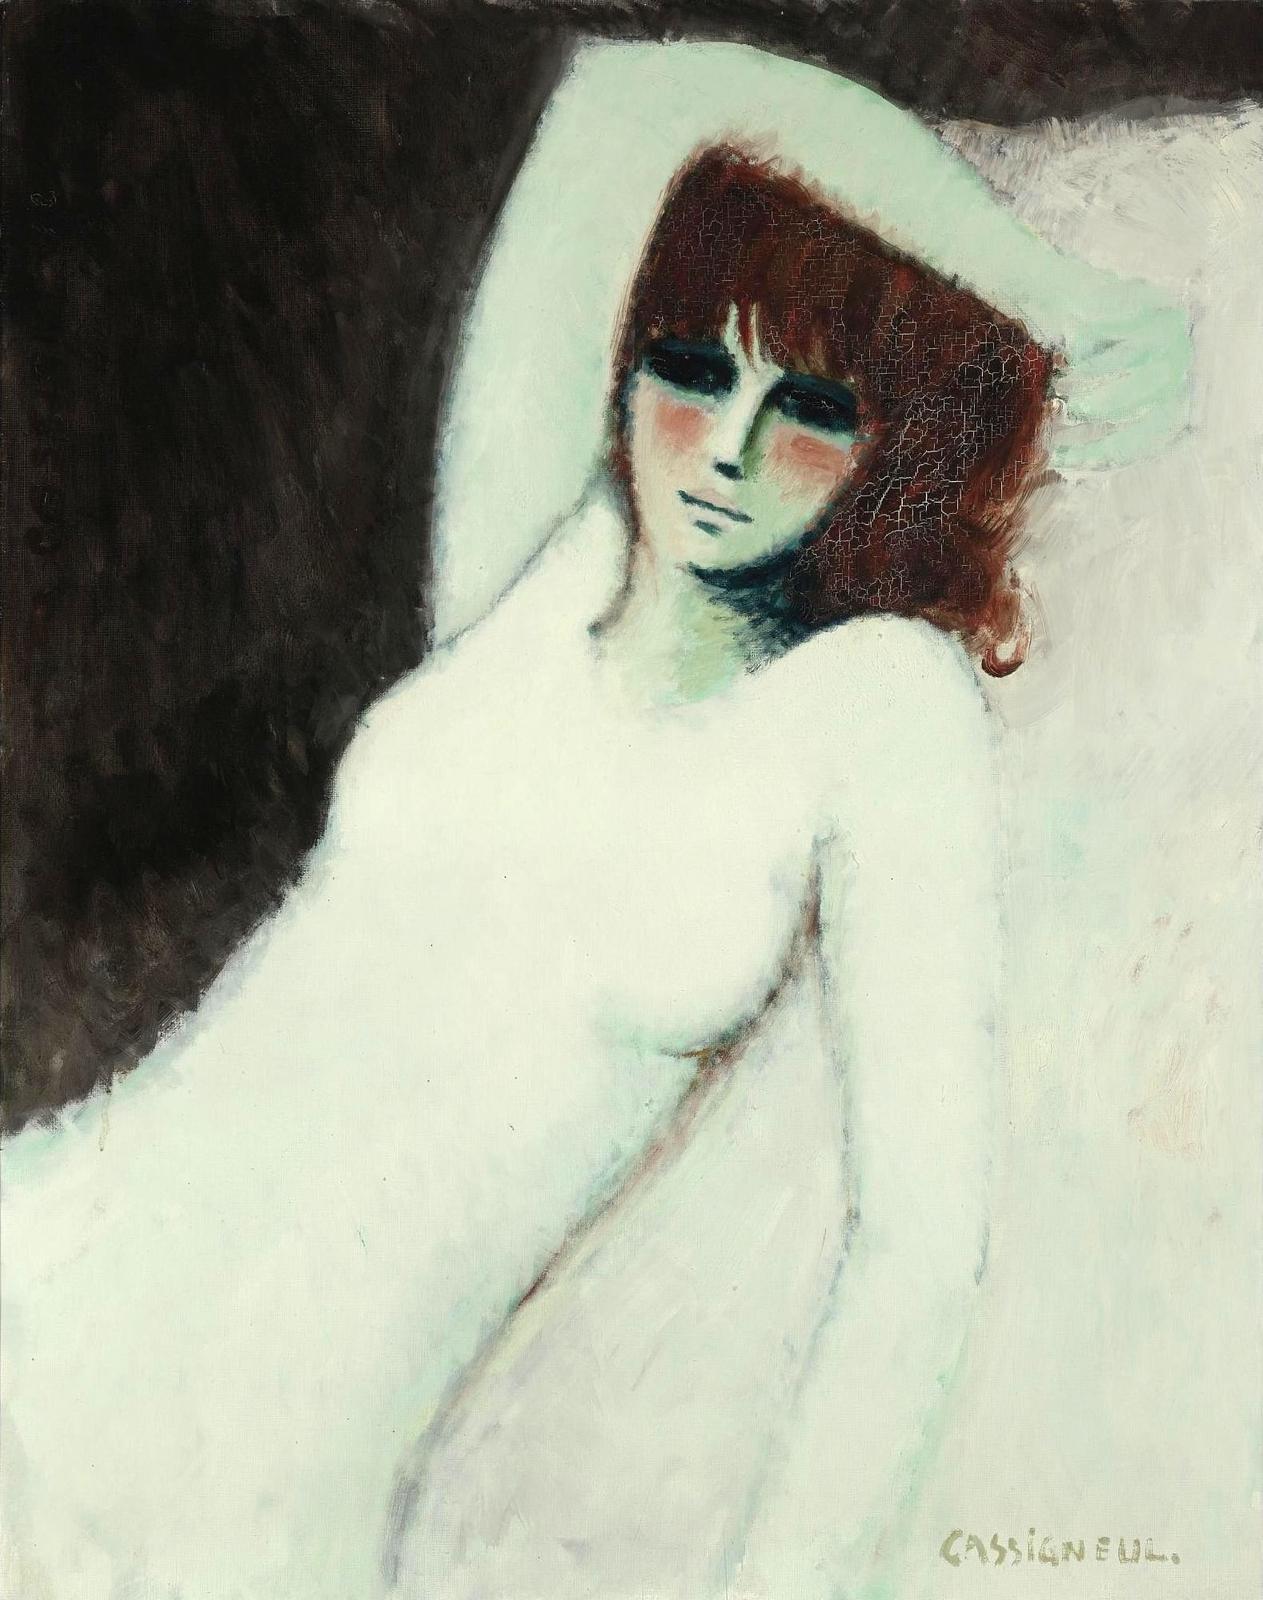 1963_Женщина (Femme)_92.1 х 73.7_х.,м._Частное собрание.jpg